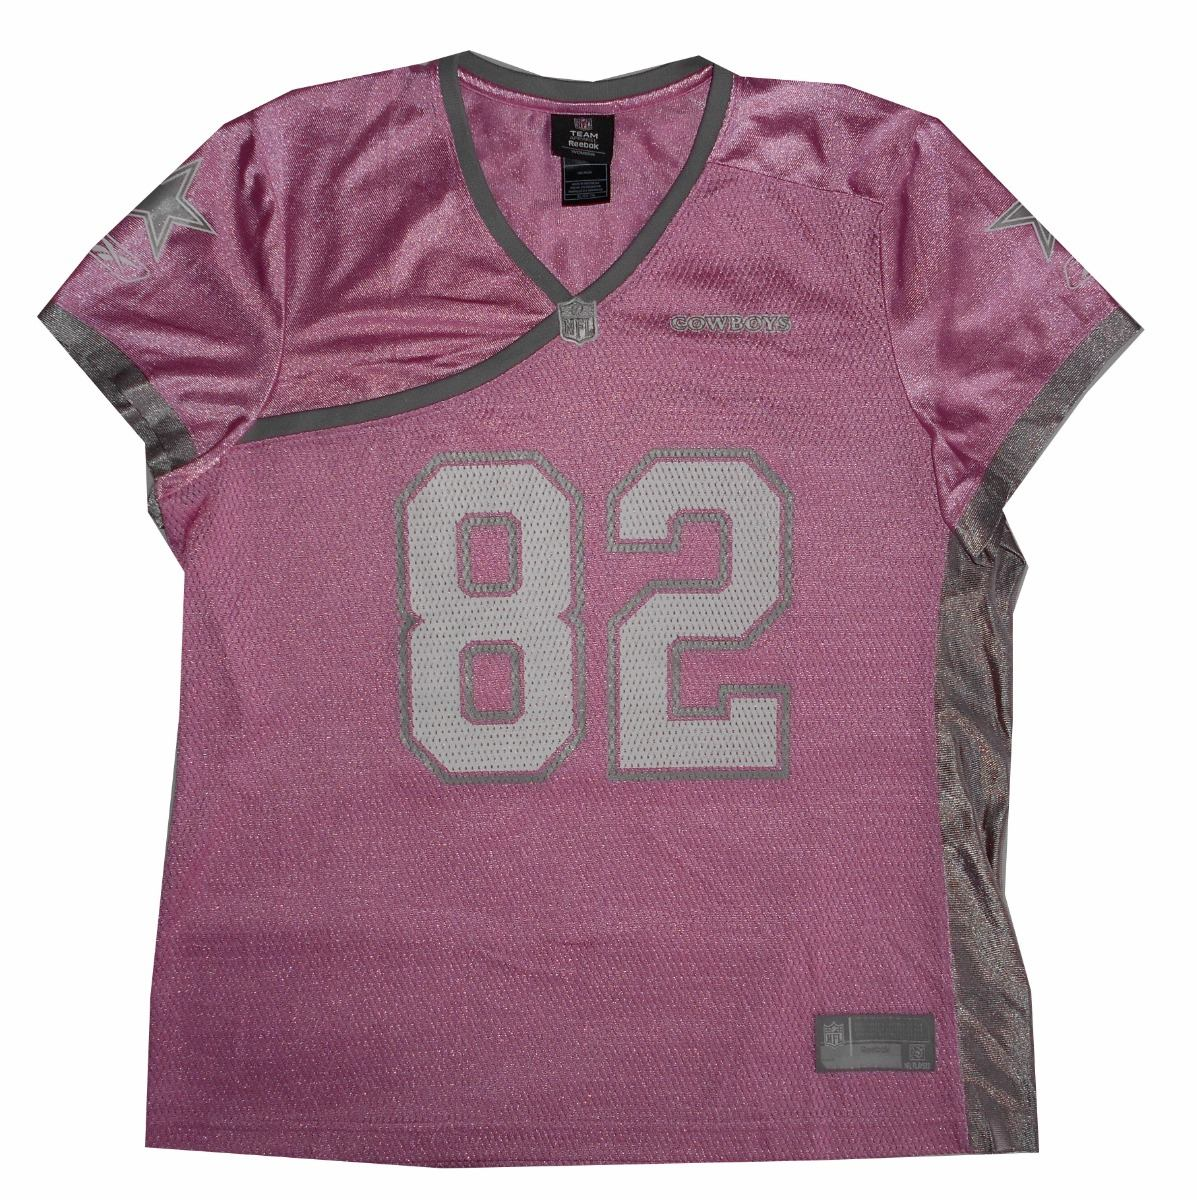 81ce02aa91 Camiseta De Nfl - Cowboys (juvenil mujer) - Xl - 82 - Rbx -   790